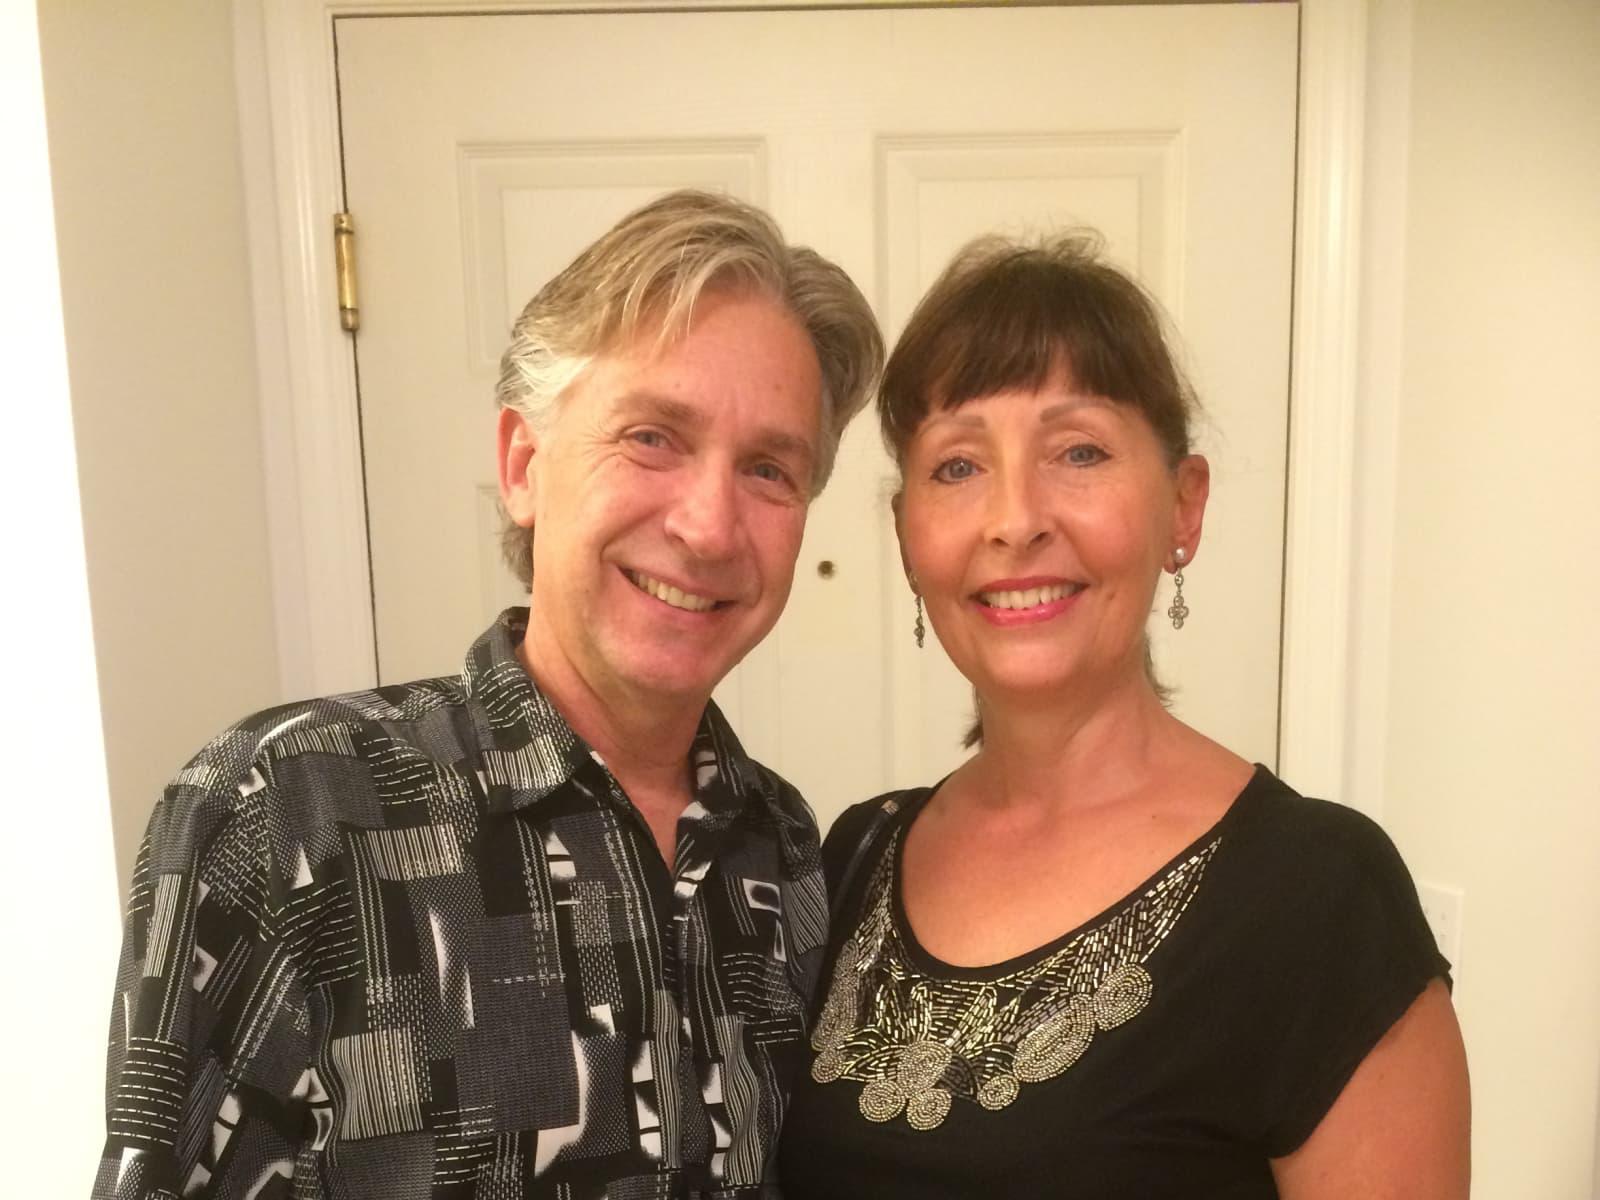 Carola & Thomas from Nueva Gorgona, Panama